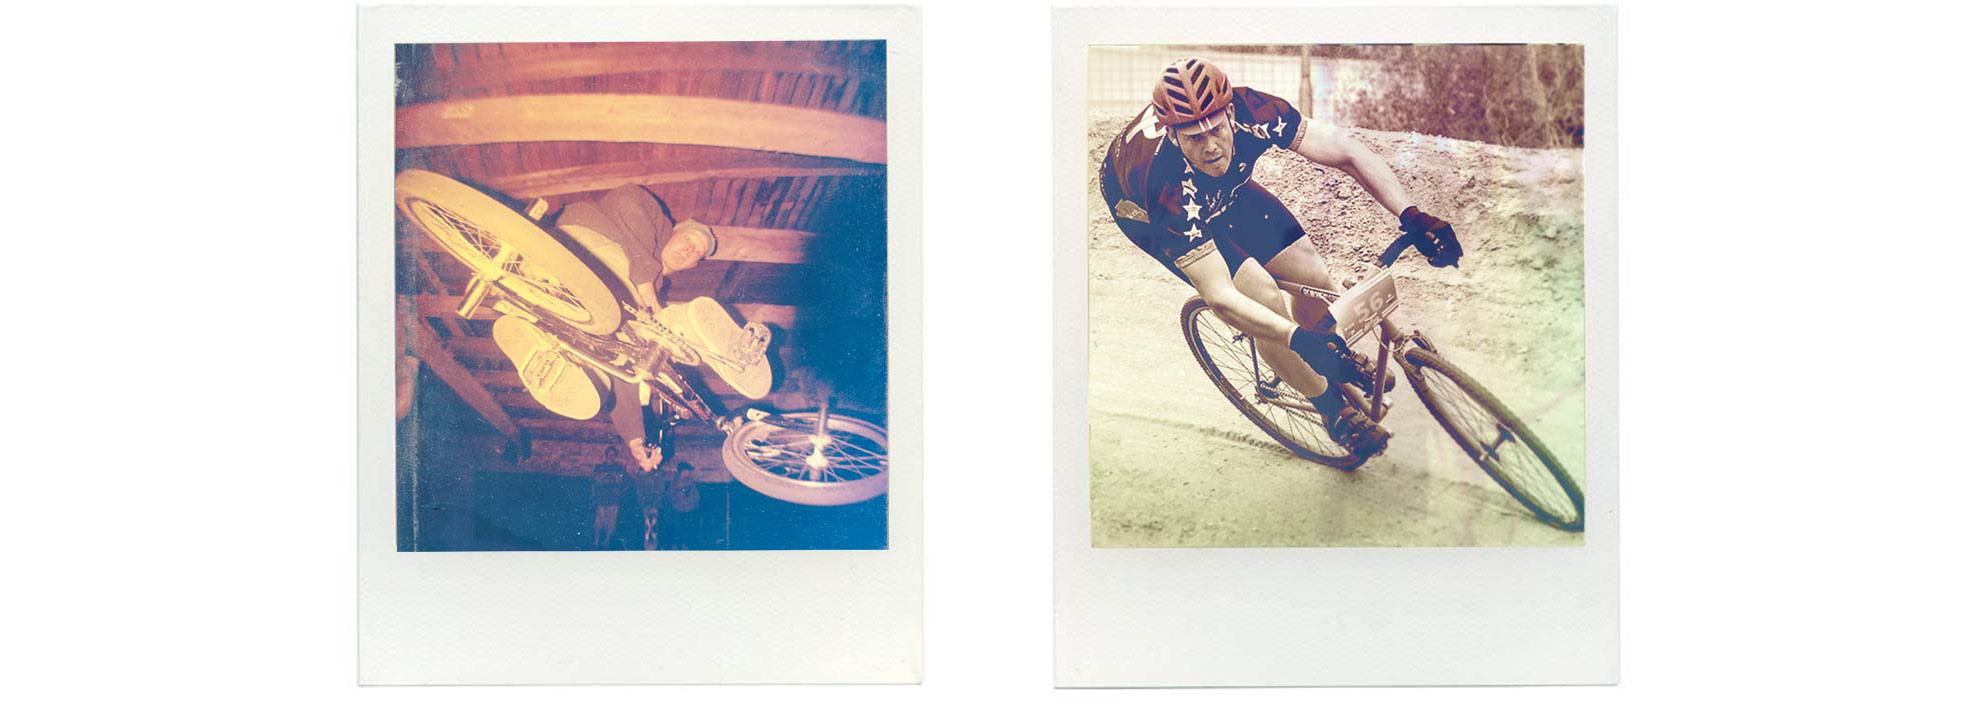 about-me-erik-de-bruin-blueorangegraphics-graphic-design-fashion-apparel-sport.jpg